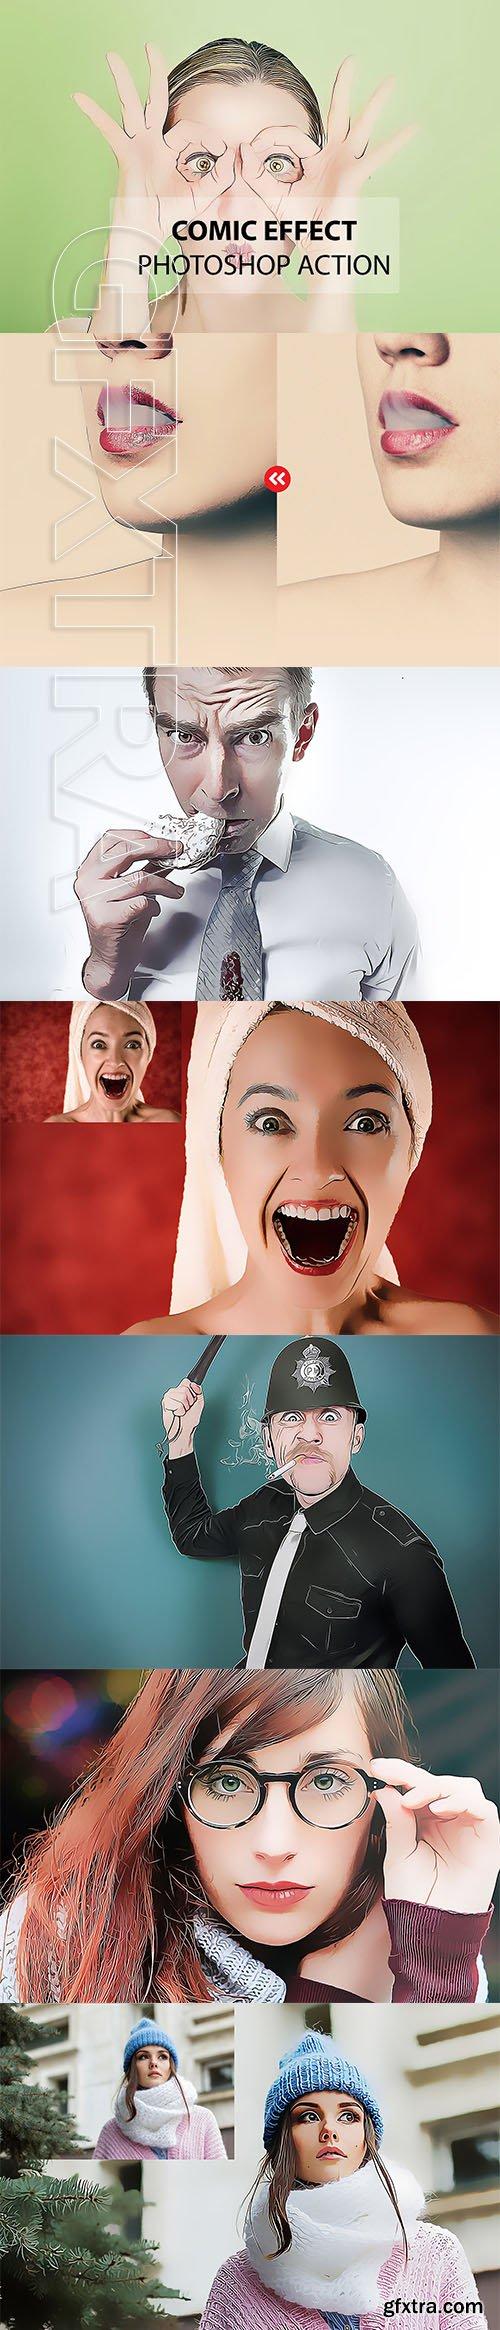 CreativeMarket - Comic Effect - Photoshop Action 3169035